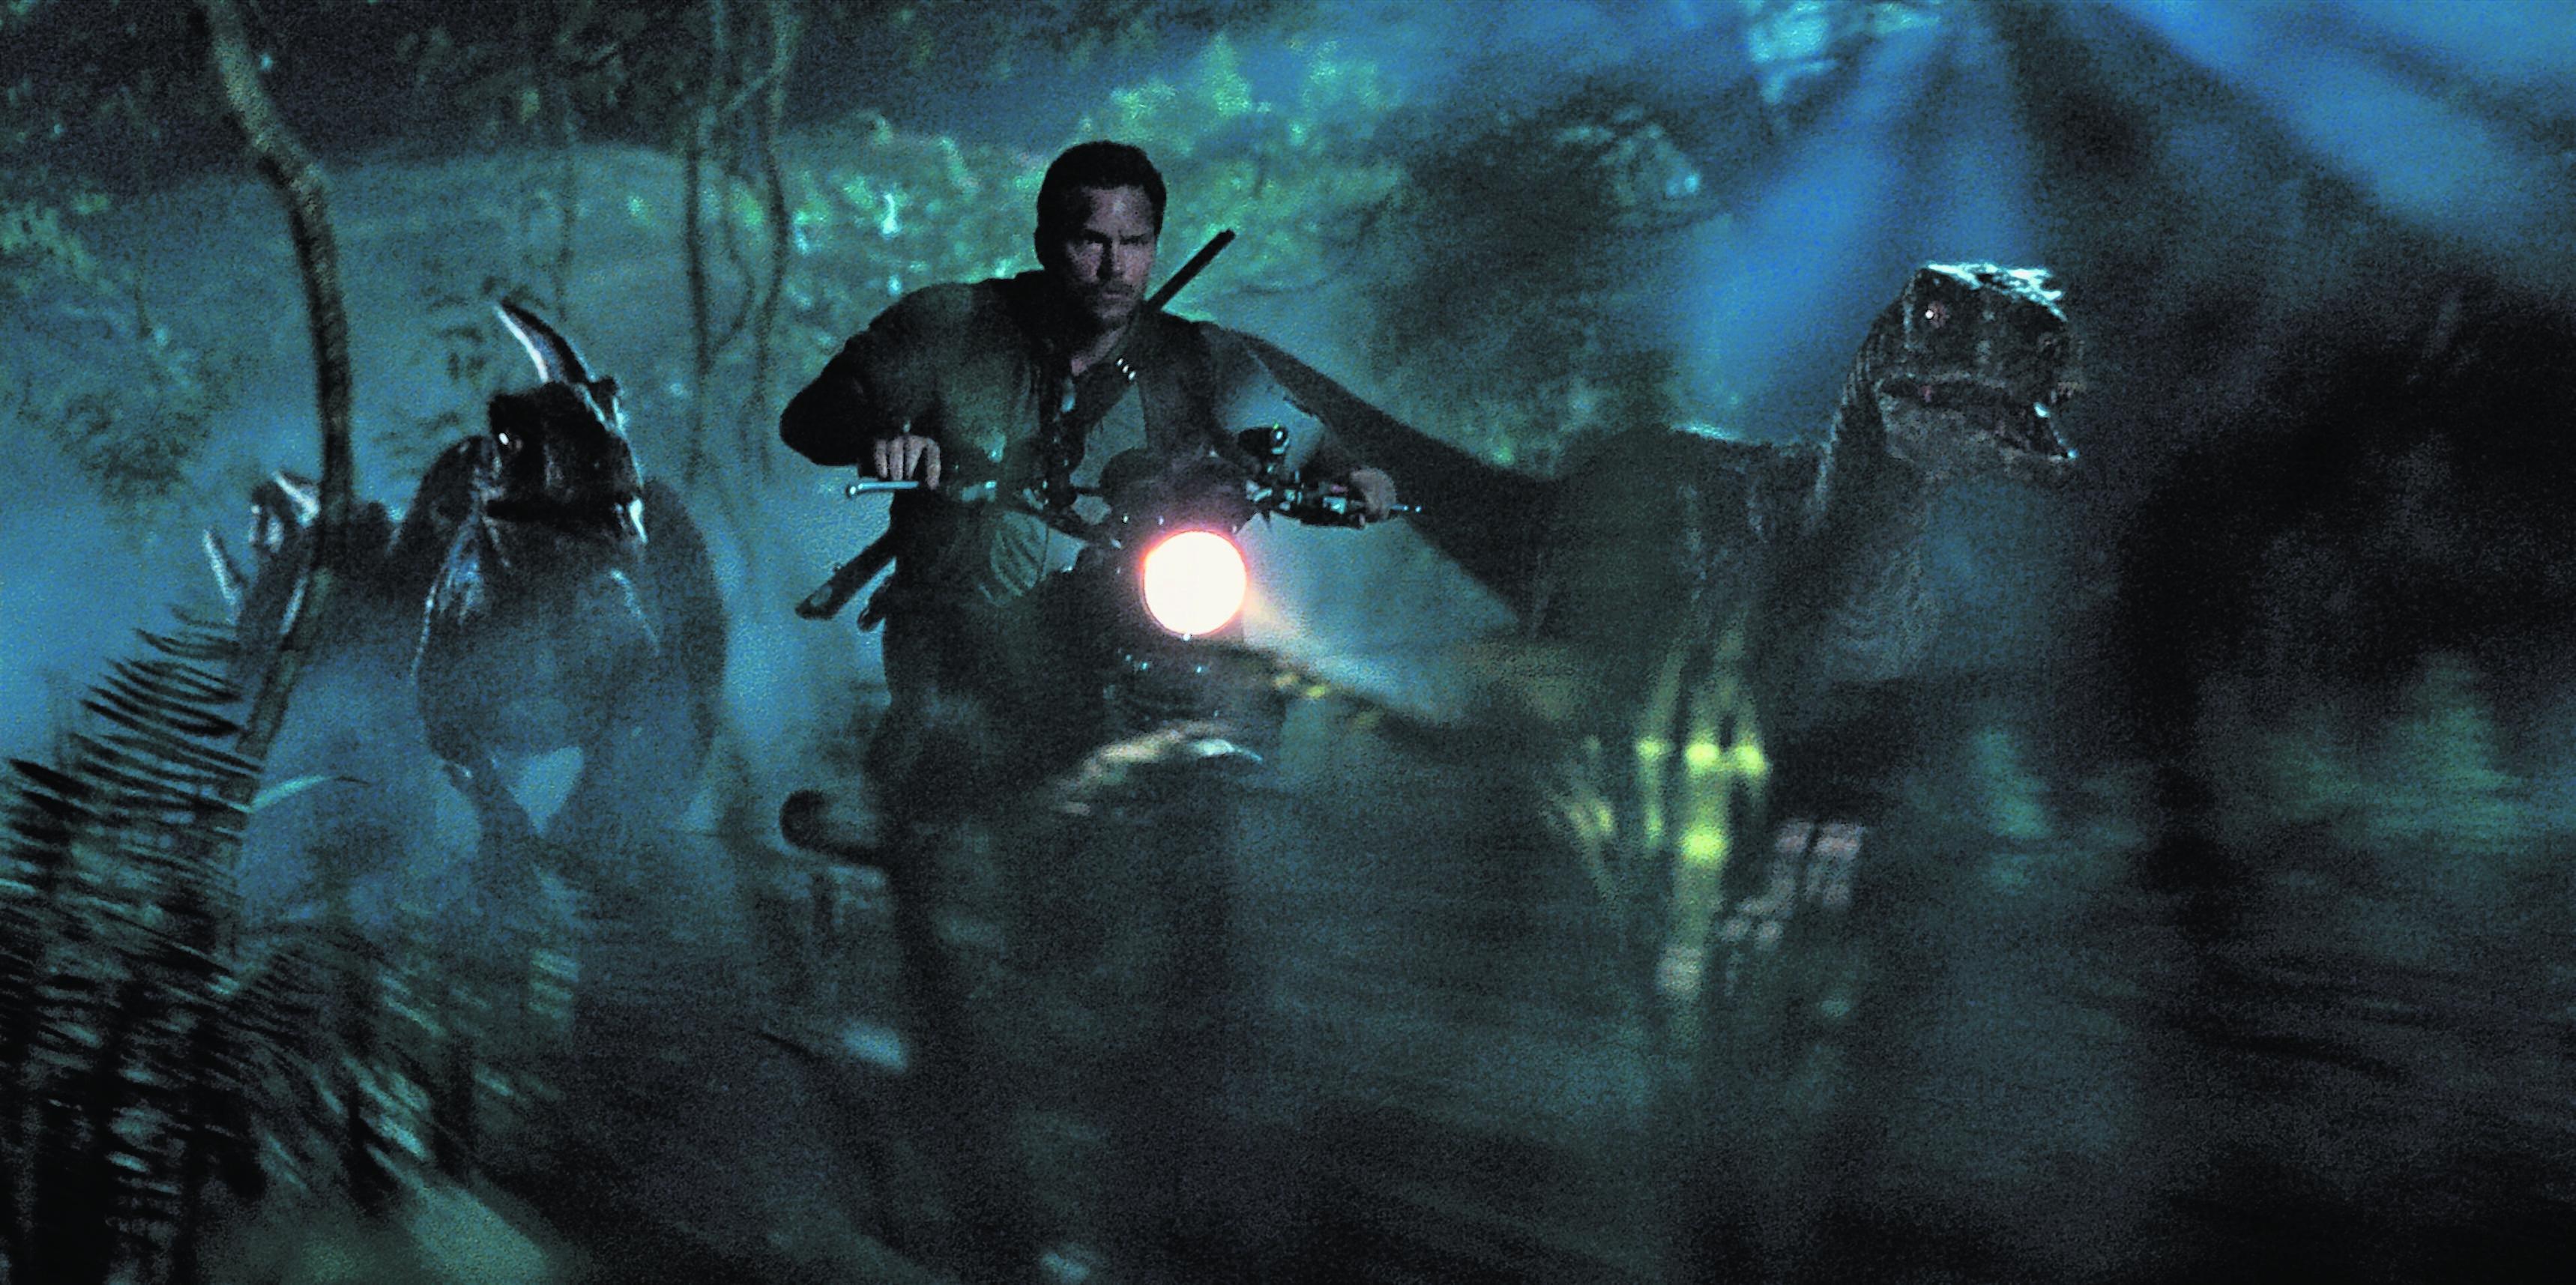 Chris Pratt takes centre stage in blockbuster Jurassic World